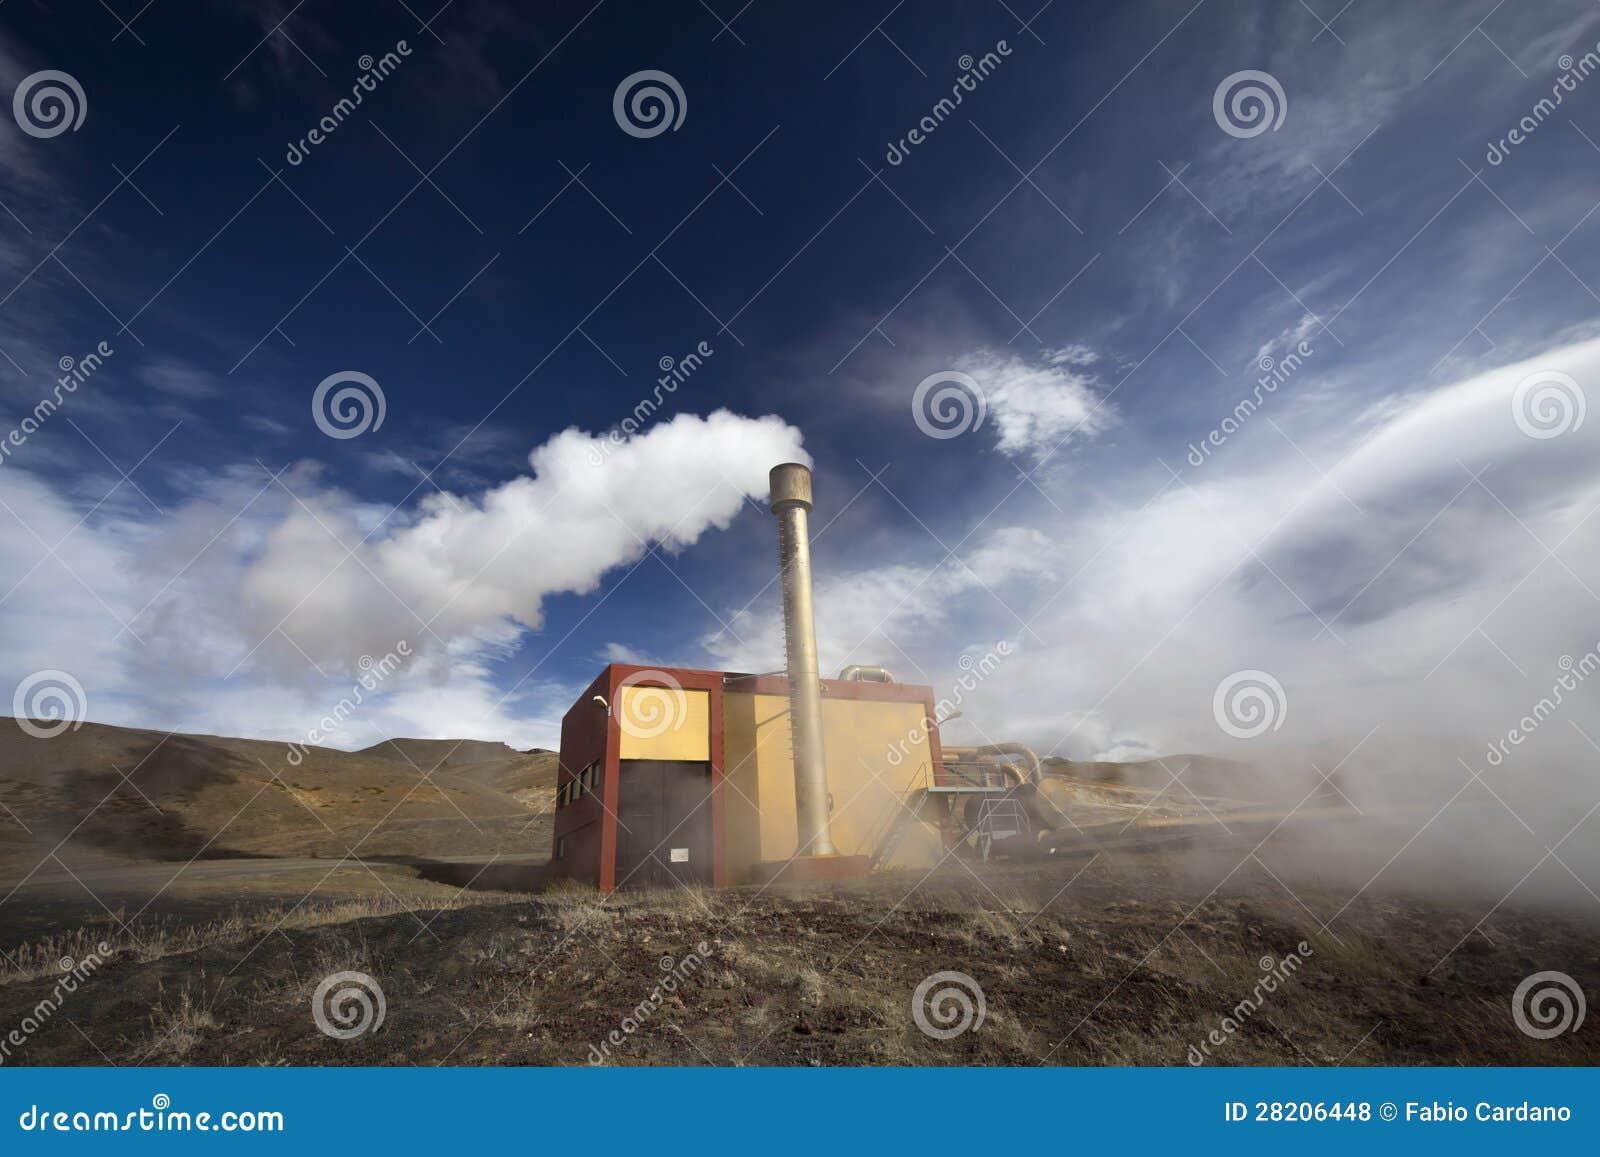 Geothermische energieinstallatie